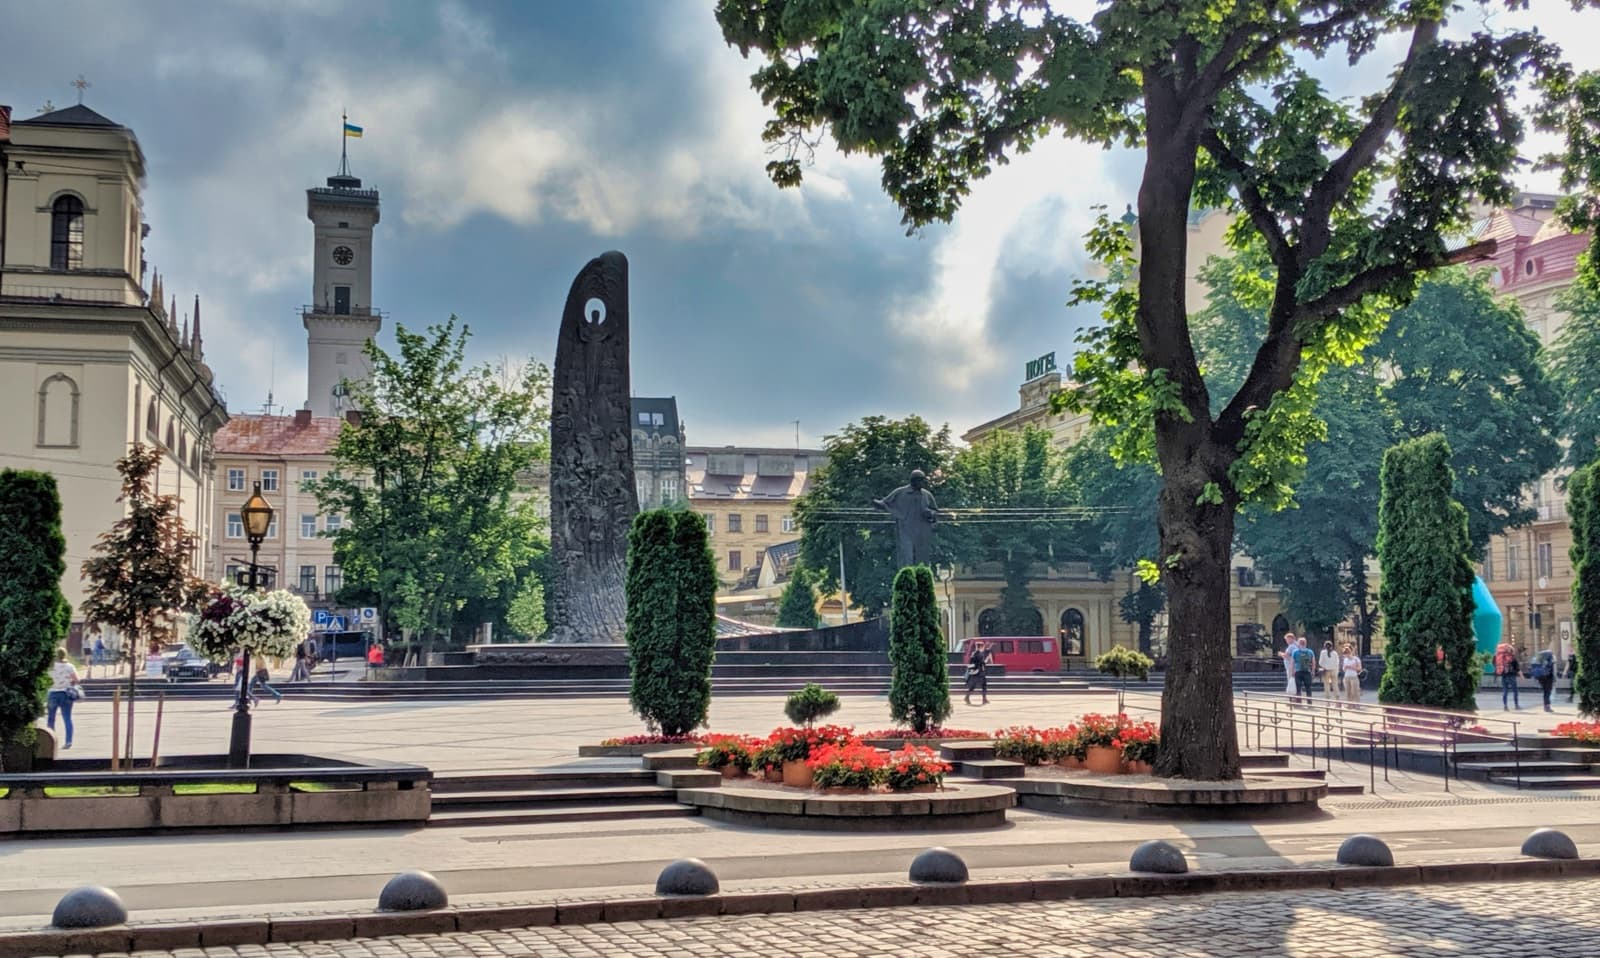 Statue Of Taras Shevchenko In Central Lviv